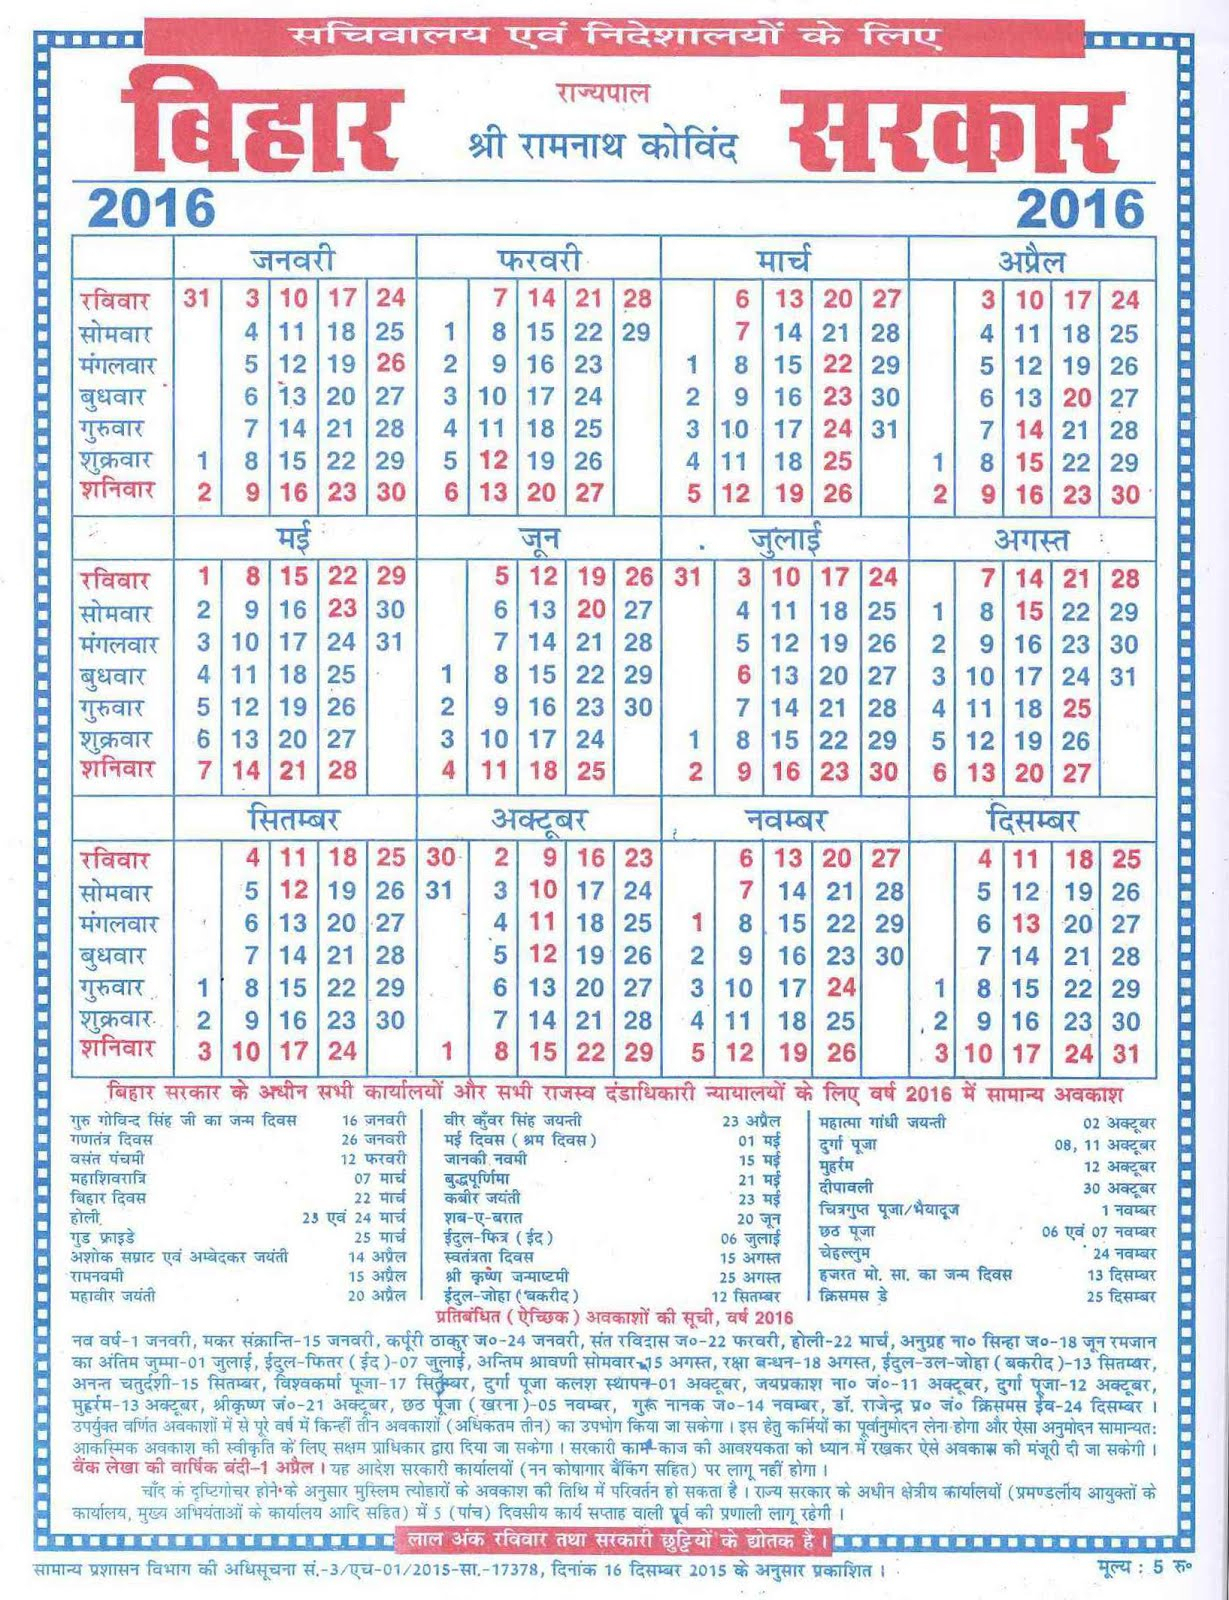 Bihar Govt Calendar 2020 Pdf | Calendar For Planning regarding Bihar Government Calander